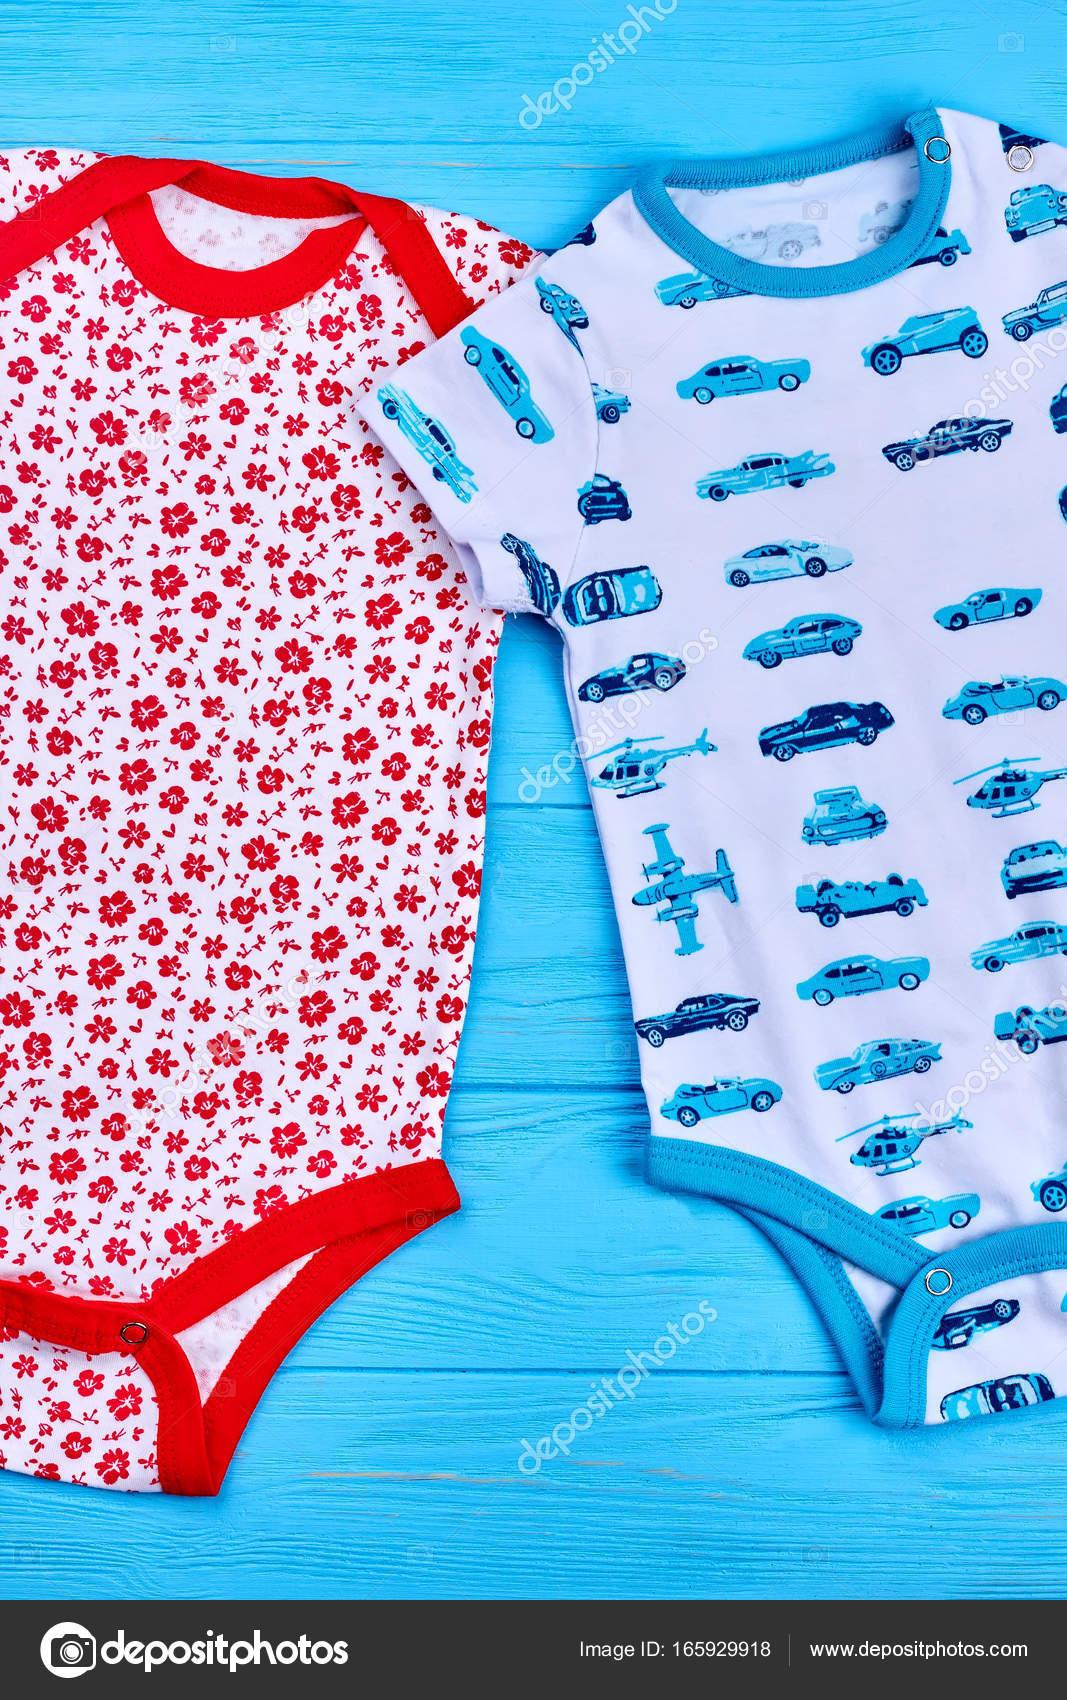 49103f29e3b Δύο χαριτωμένα νεογέννητα βαμβάκι κορμάκια. Φίνο σχεδιασμό βρέφος αγόρια  και κορίτσια φυσικό Ολόσωμα σε μπλε φόντο ξύλινη, το top view.